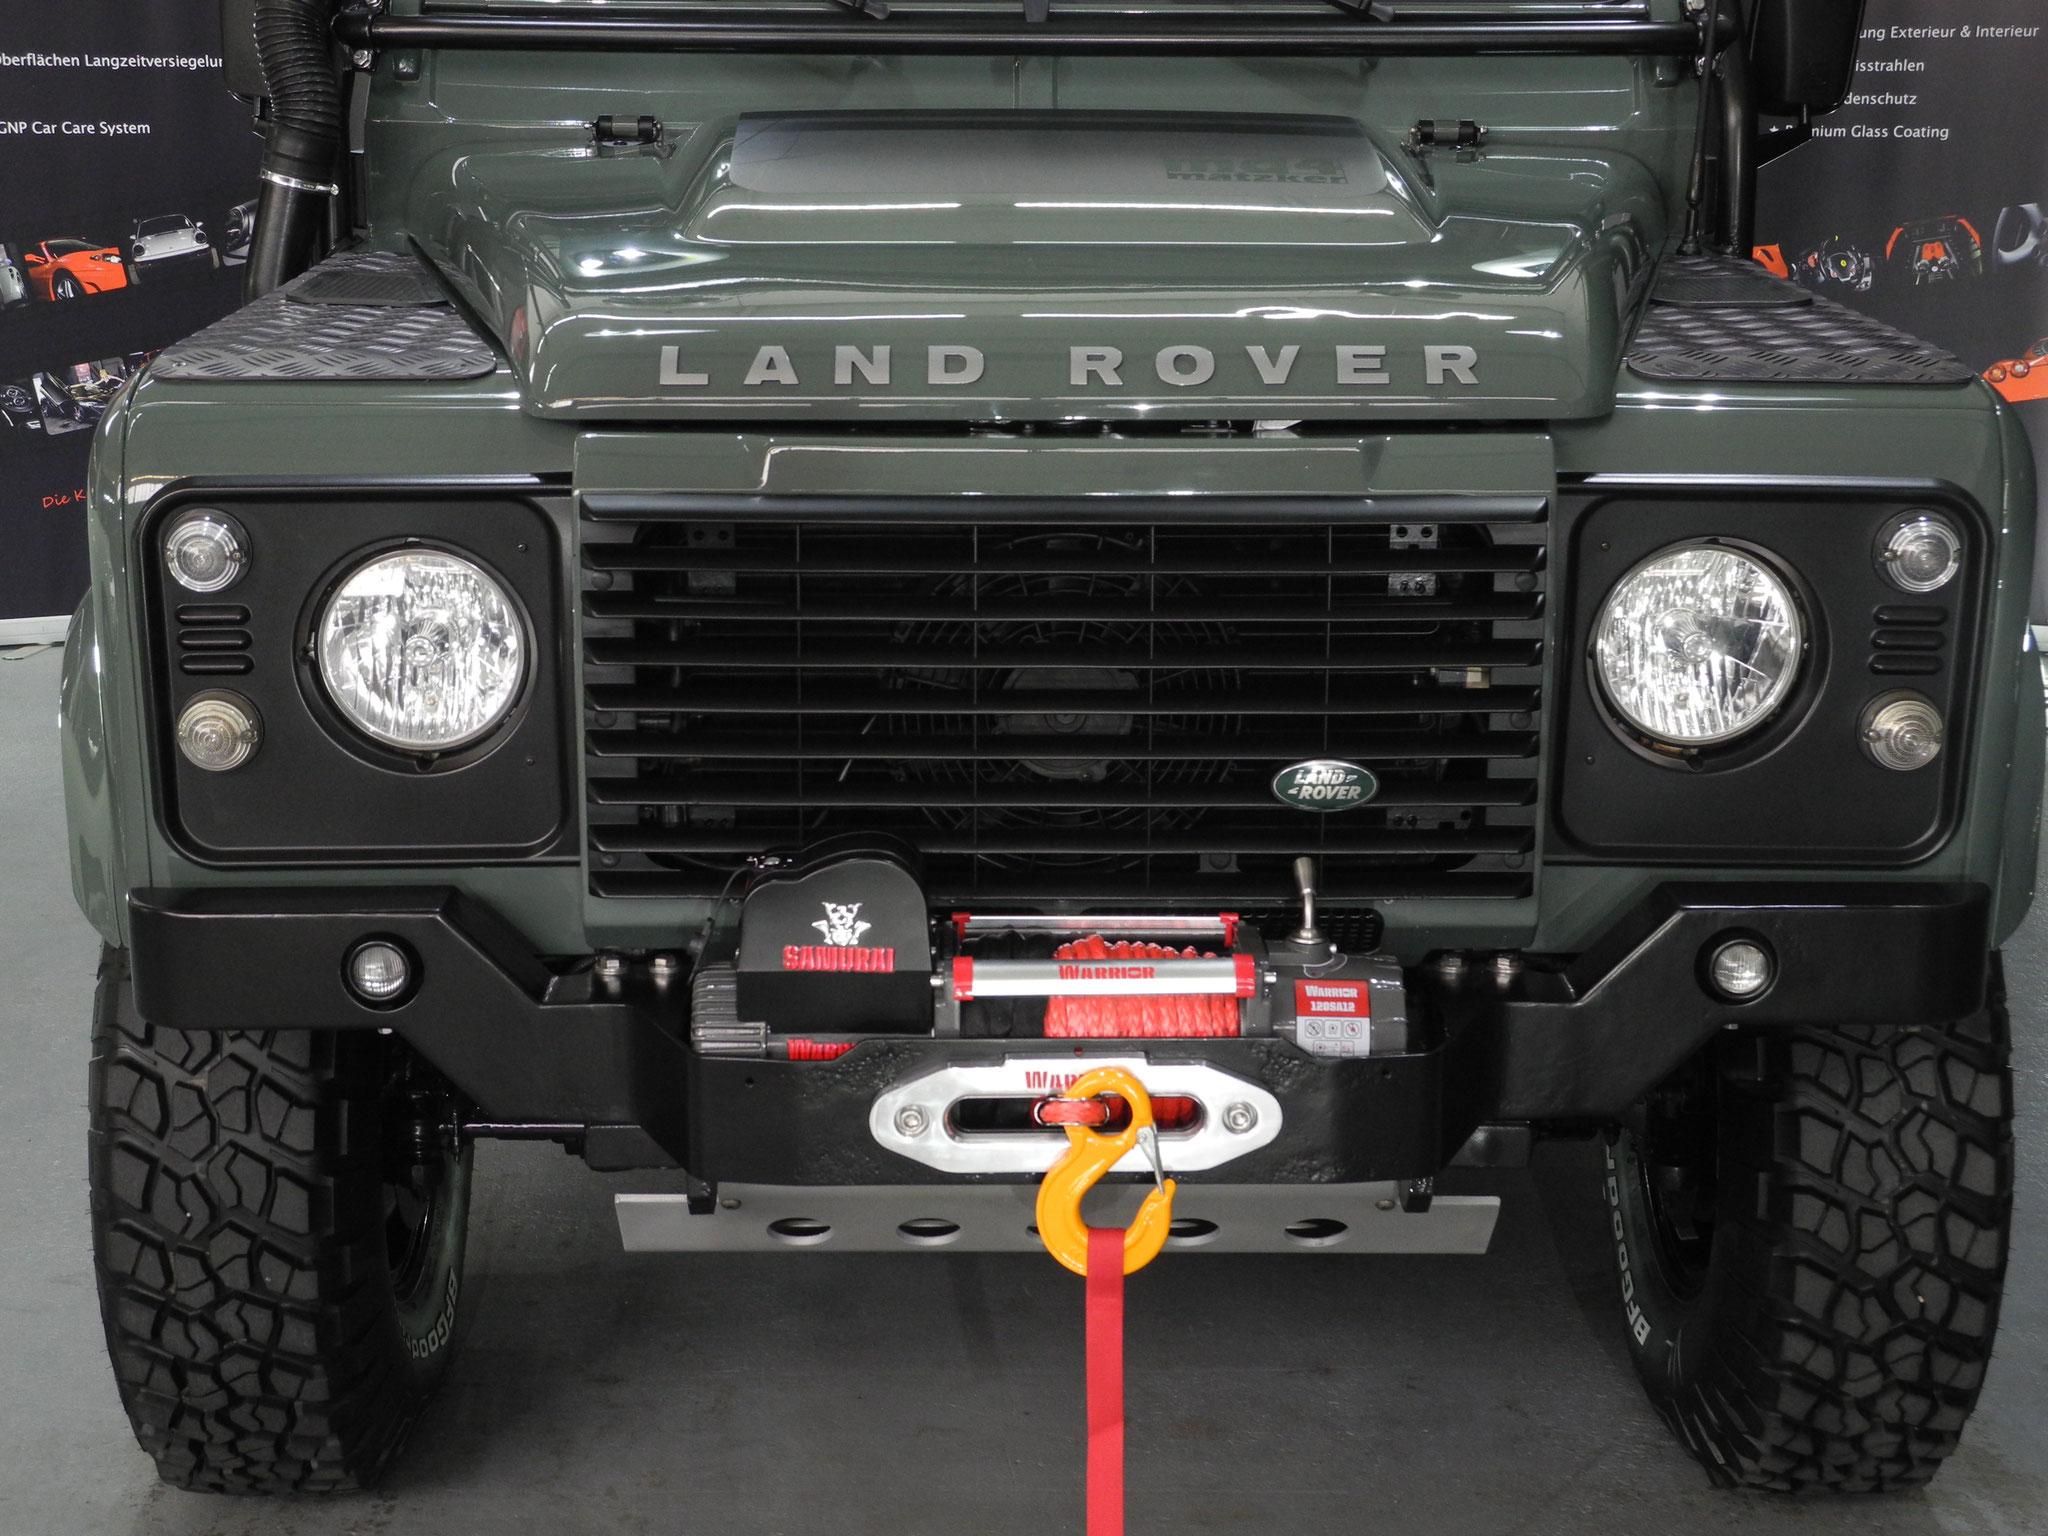 Land Rover Defender 110 Station Sondermodell Matzker Md4